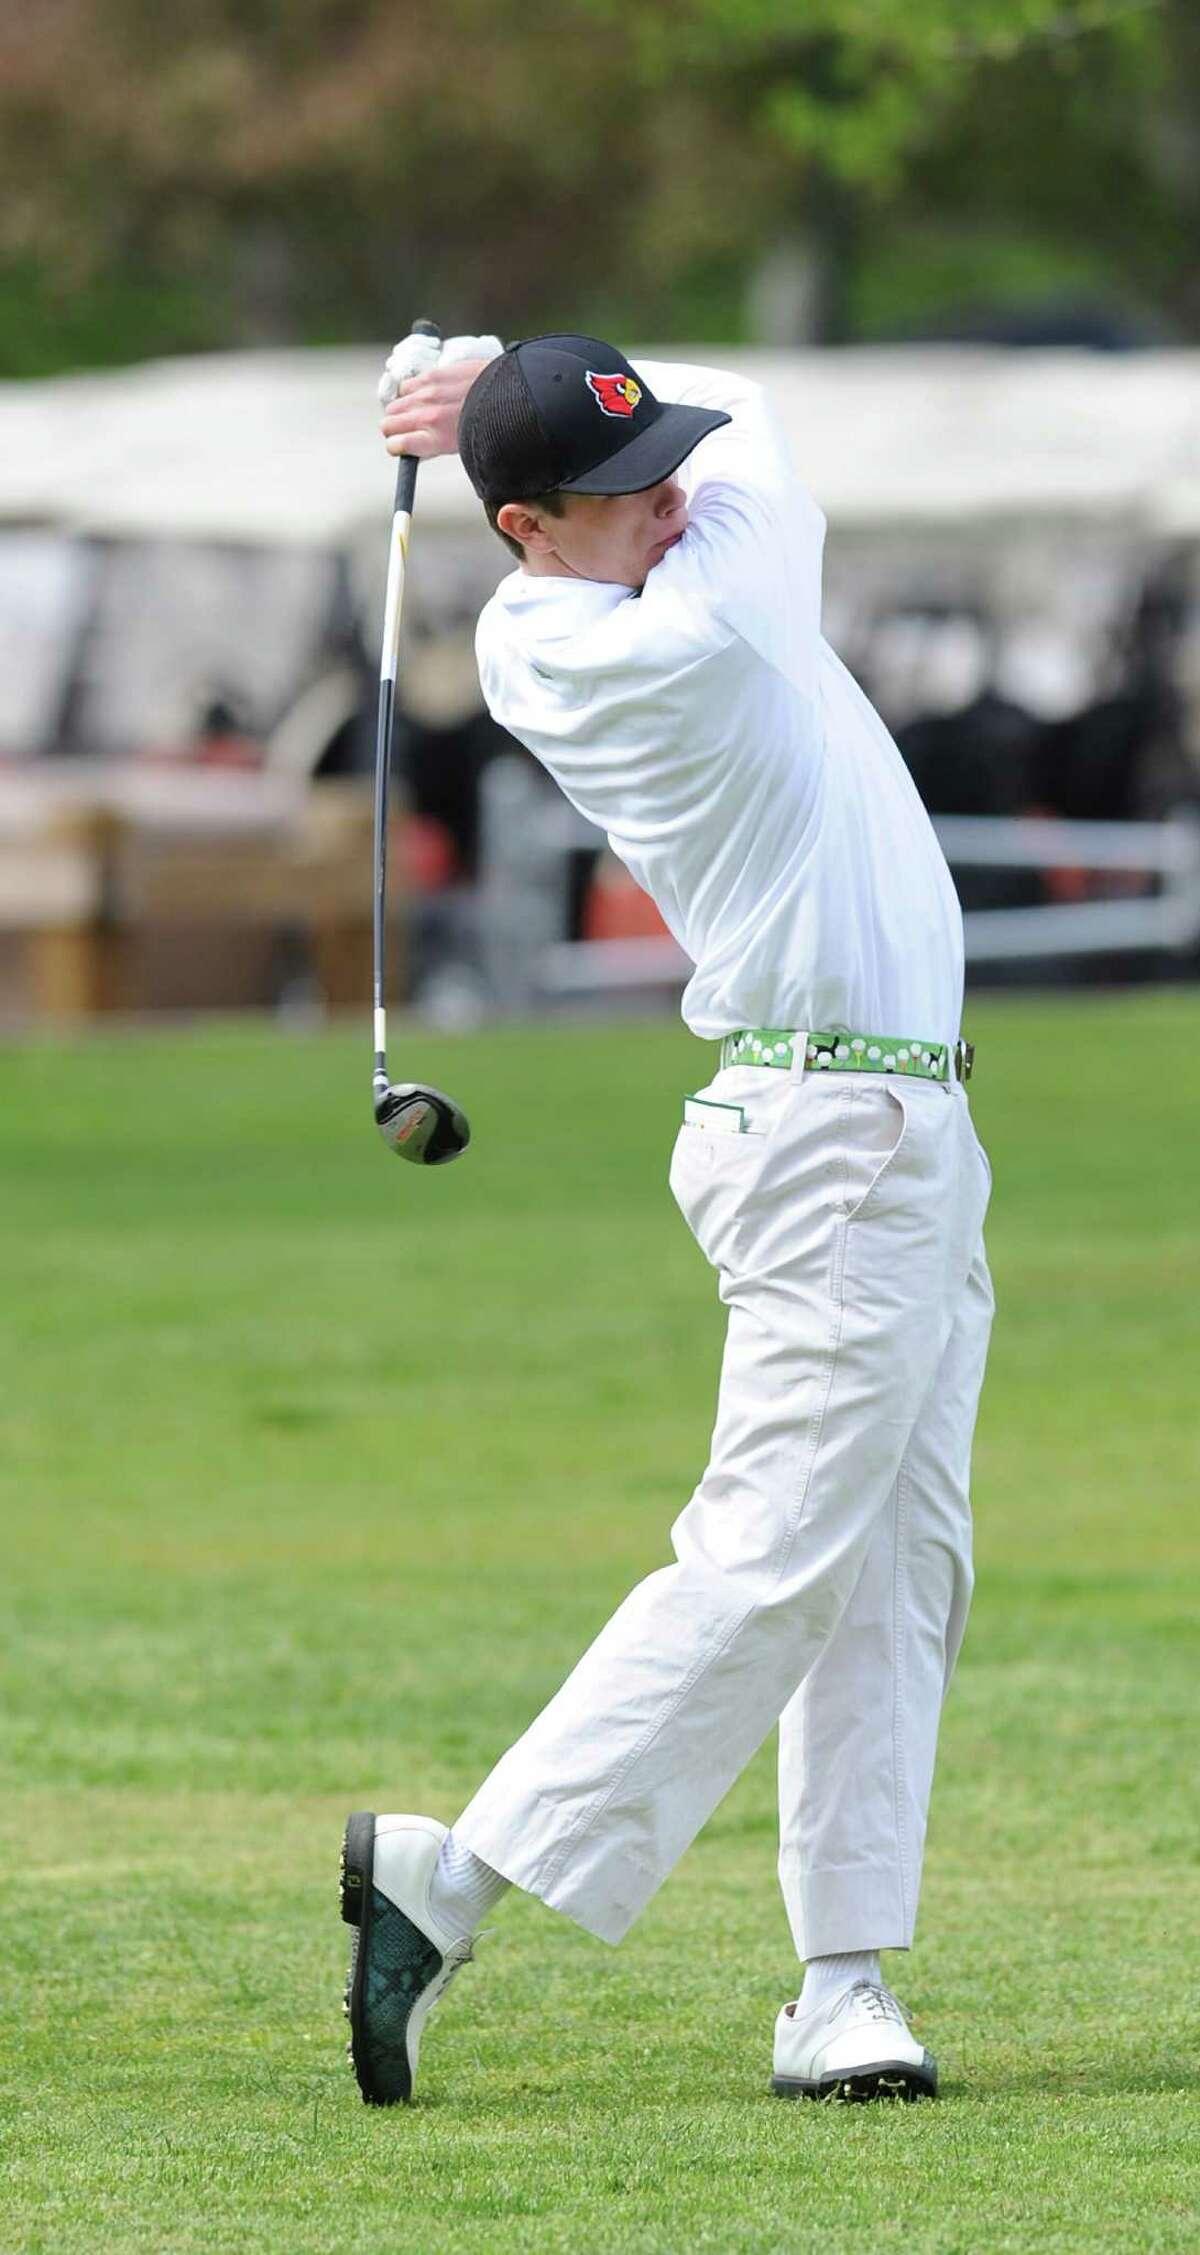 Chris Pavelic of Greenwich won the Hap Holohan tournament Tuesday.